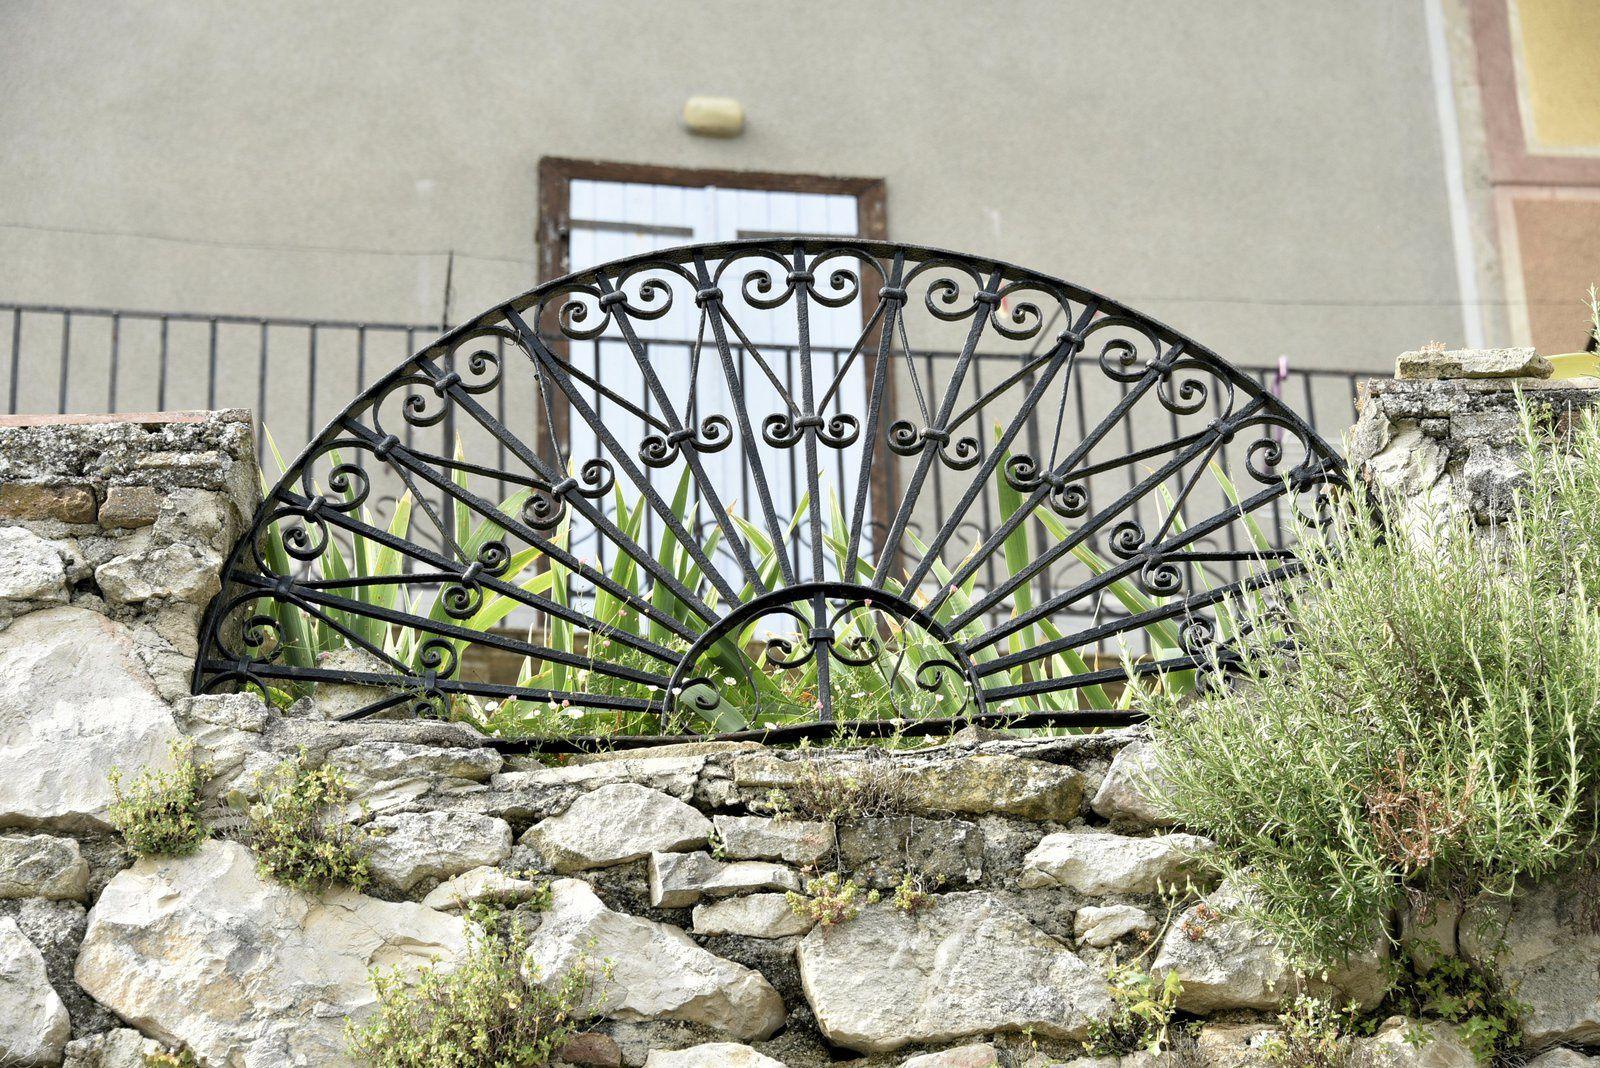 Castelnau-de-Montmiral